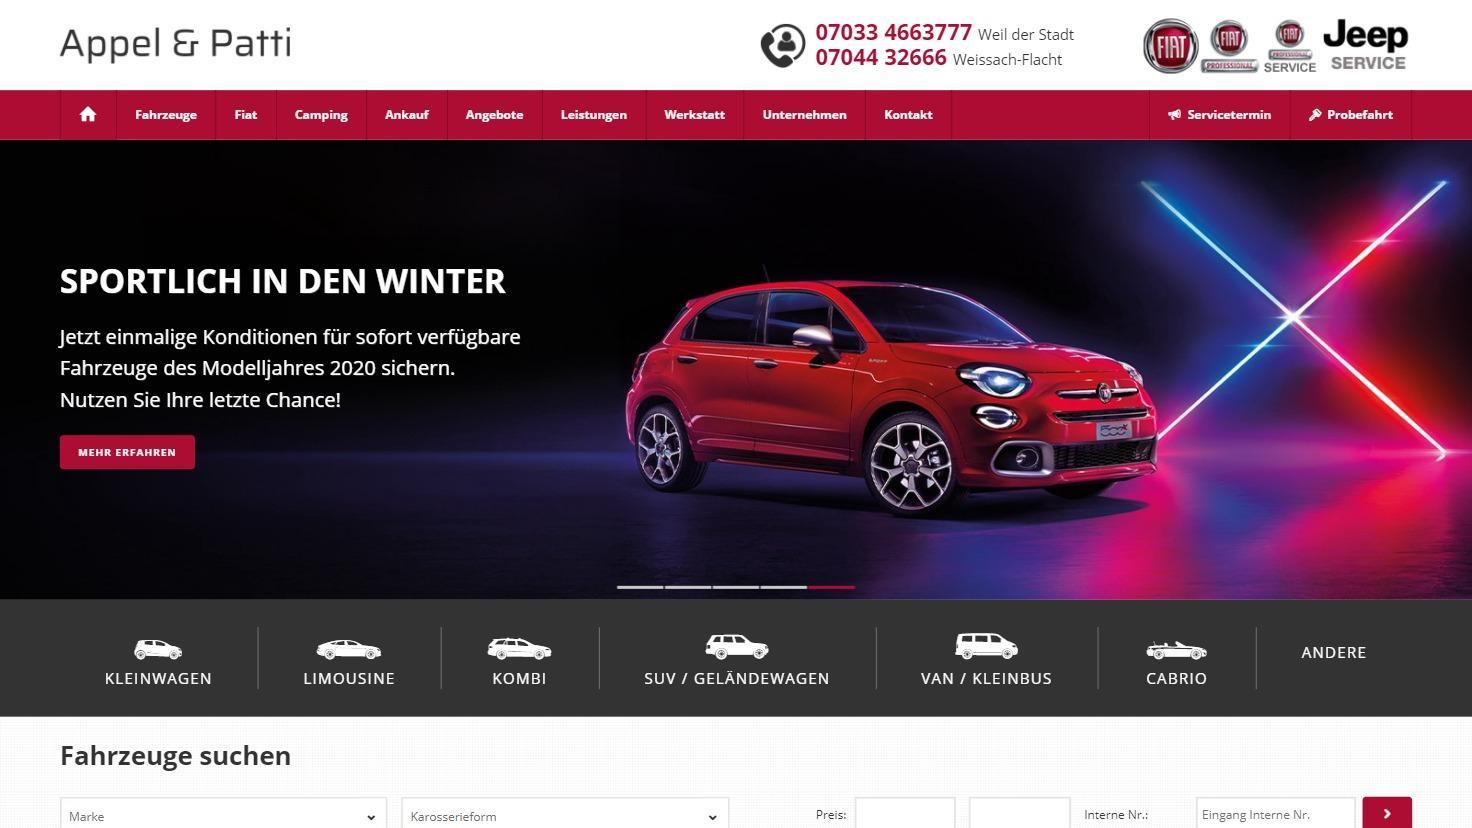 Autohaus Appel & Patti - autorisierter Fiat, Fiat Professional und Jeep Vertragspartner